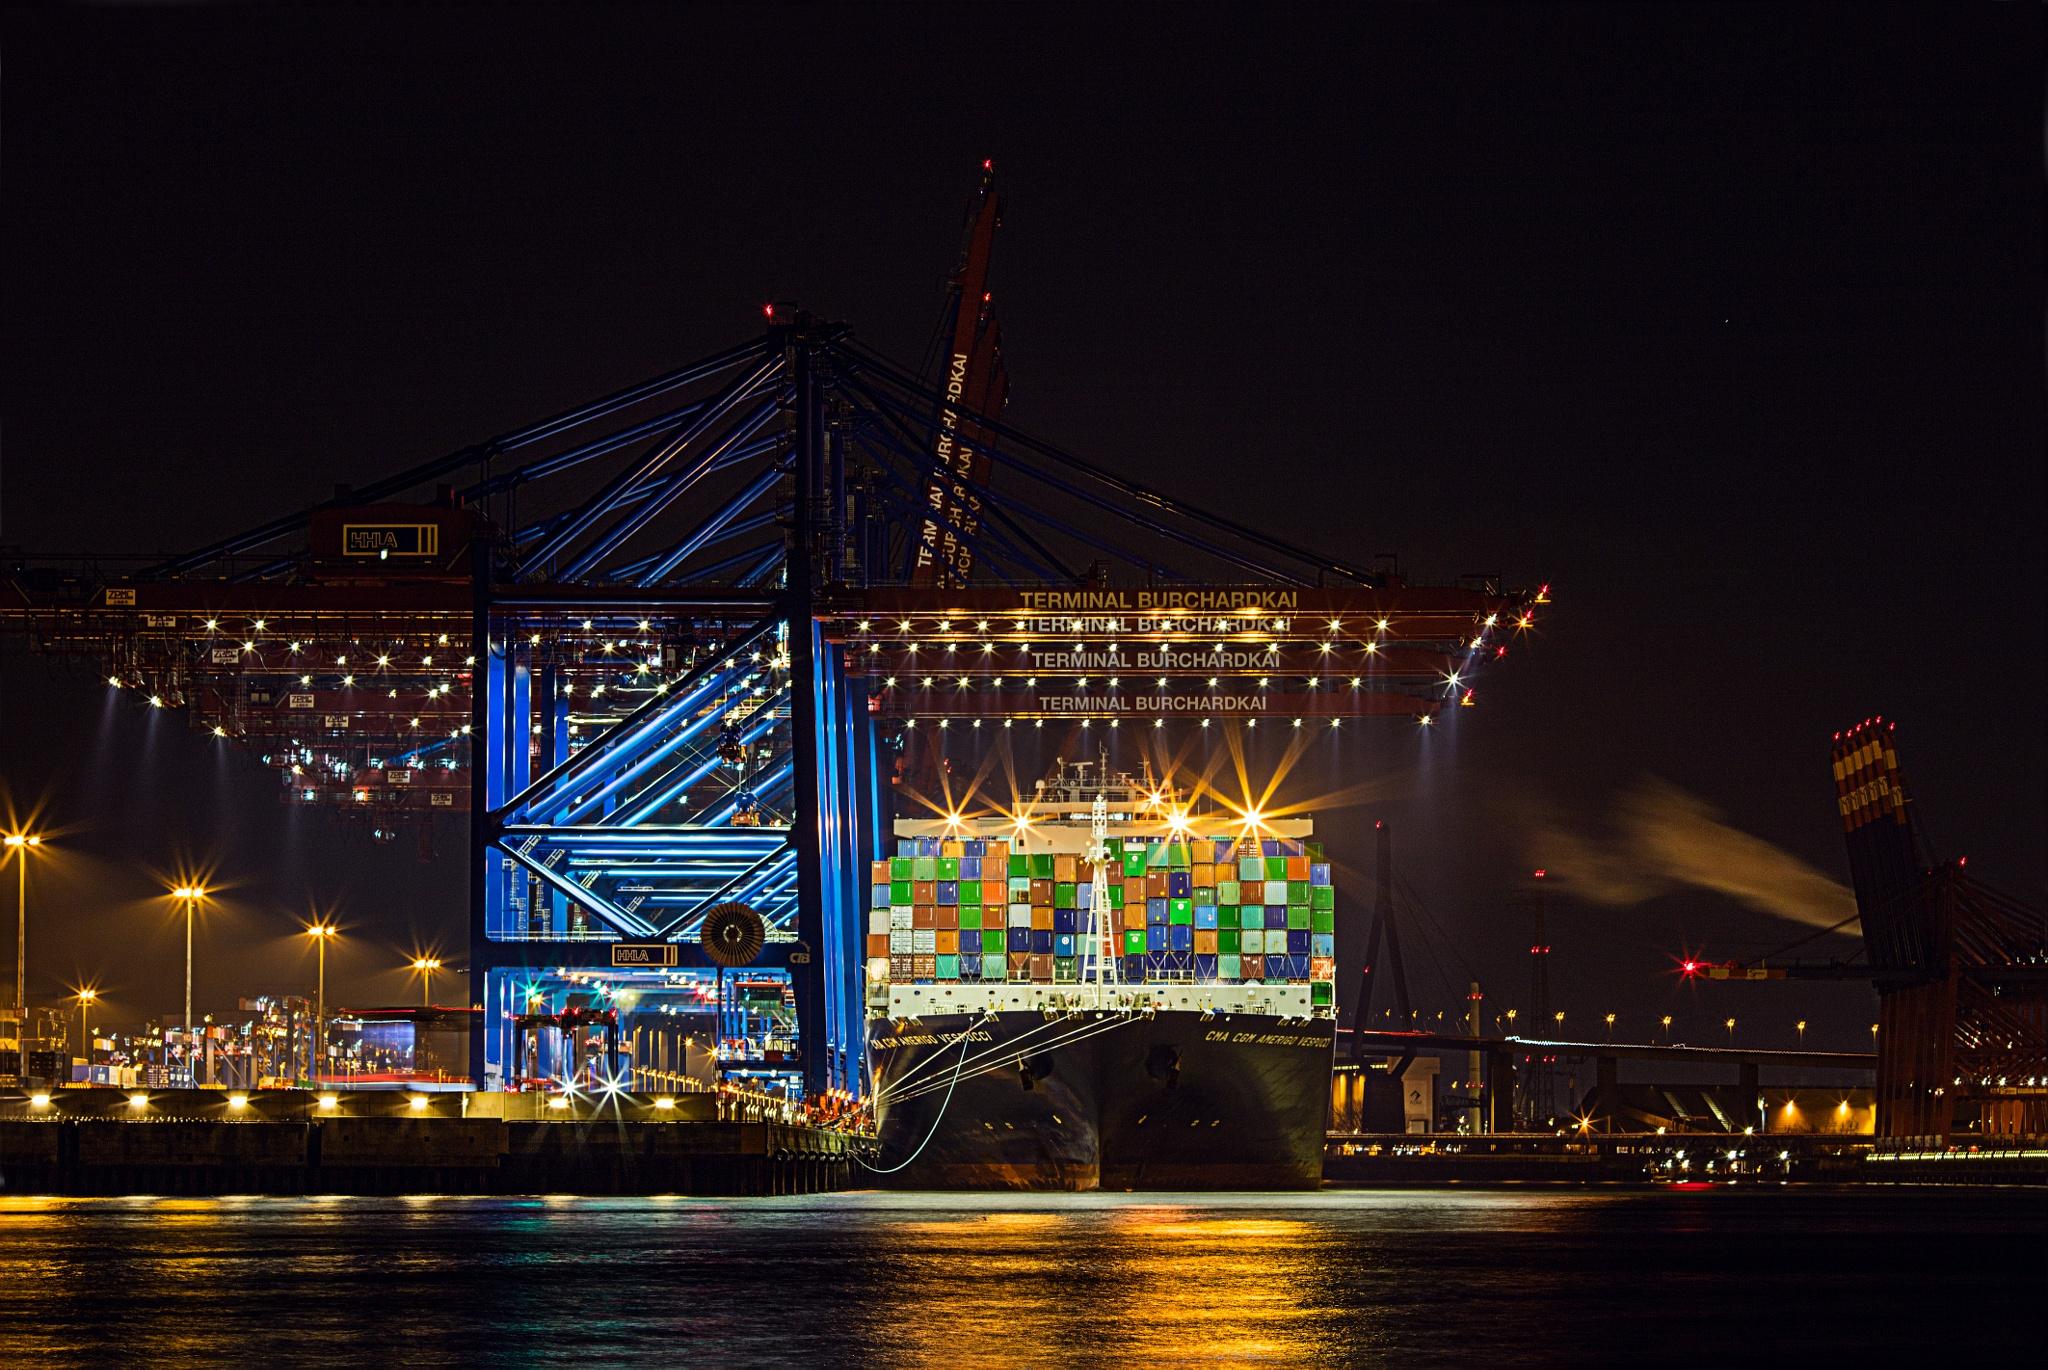 Containerterminal by berndwilleke